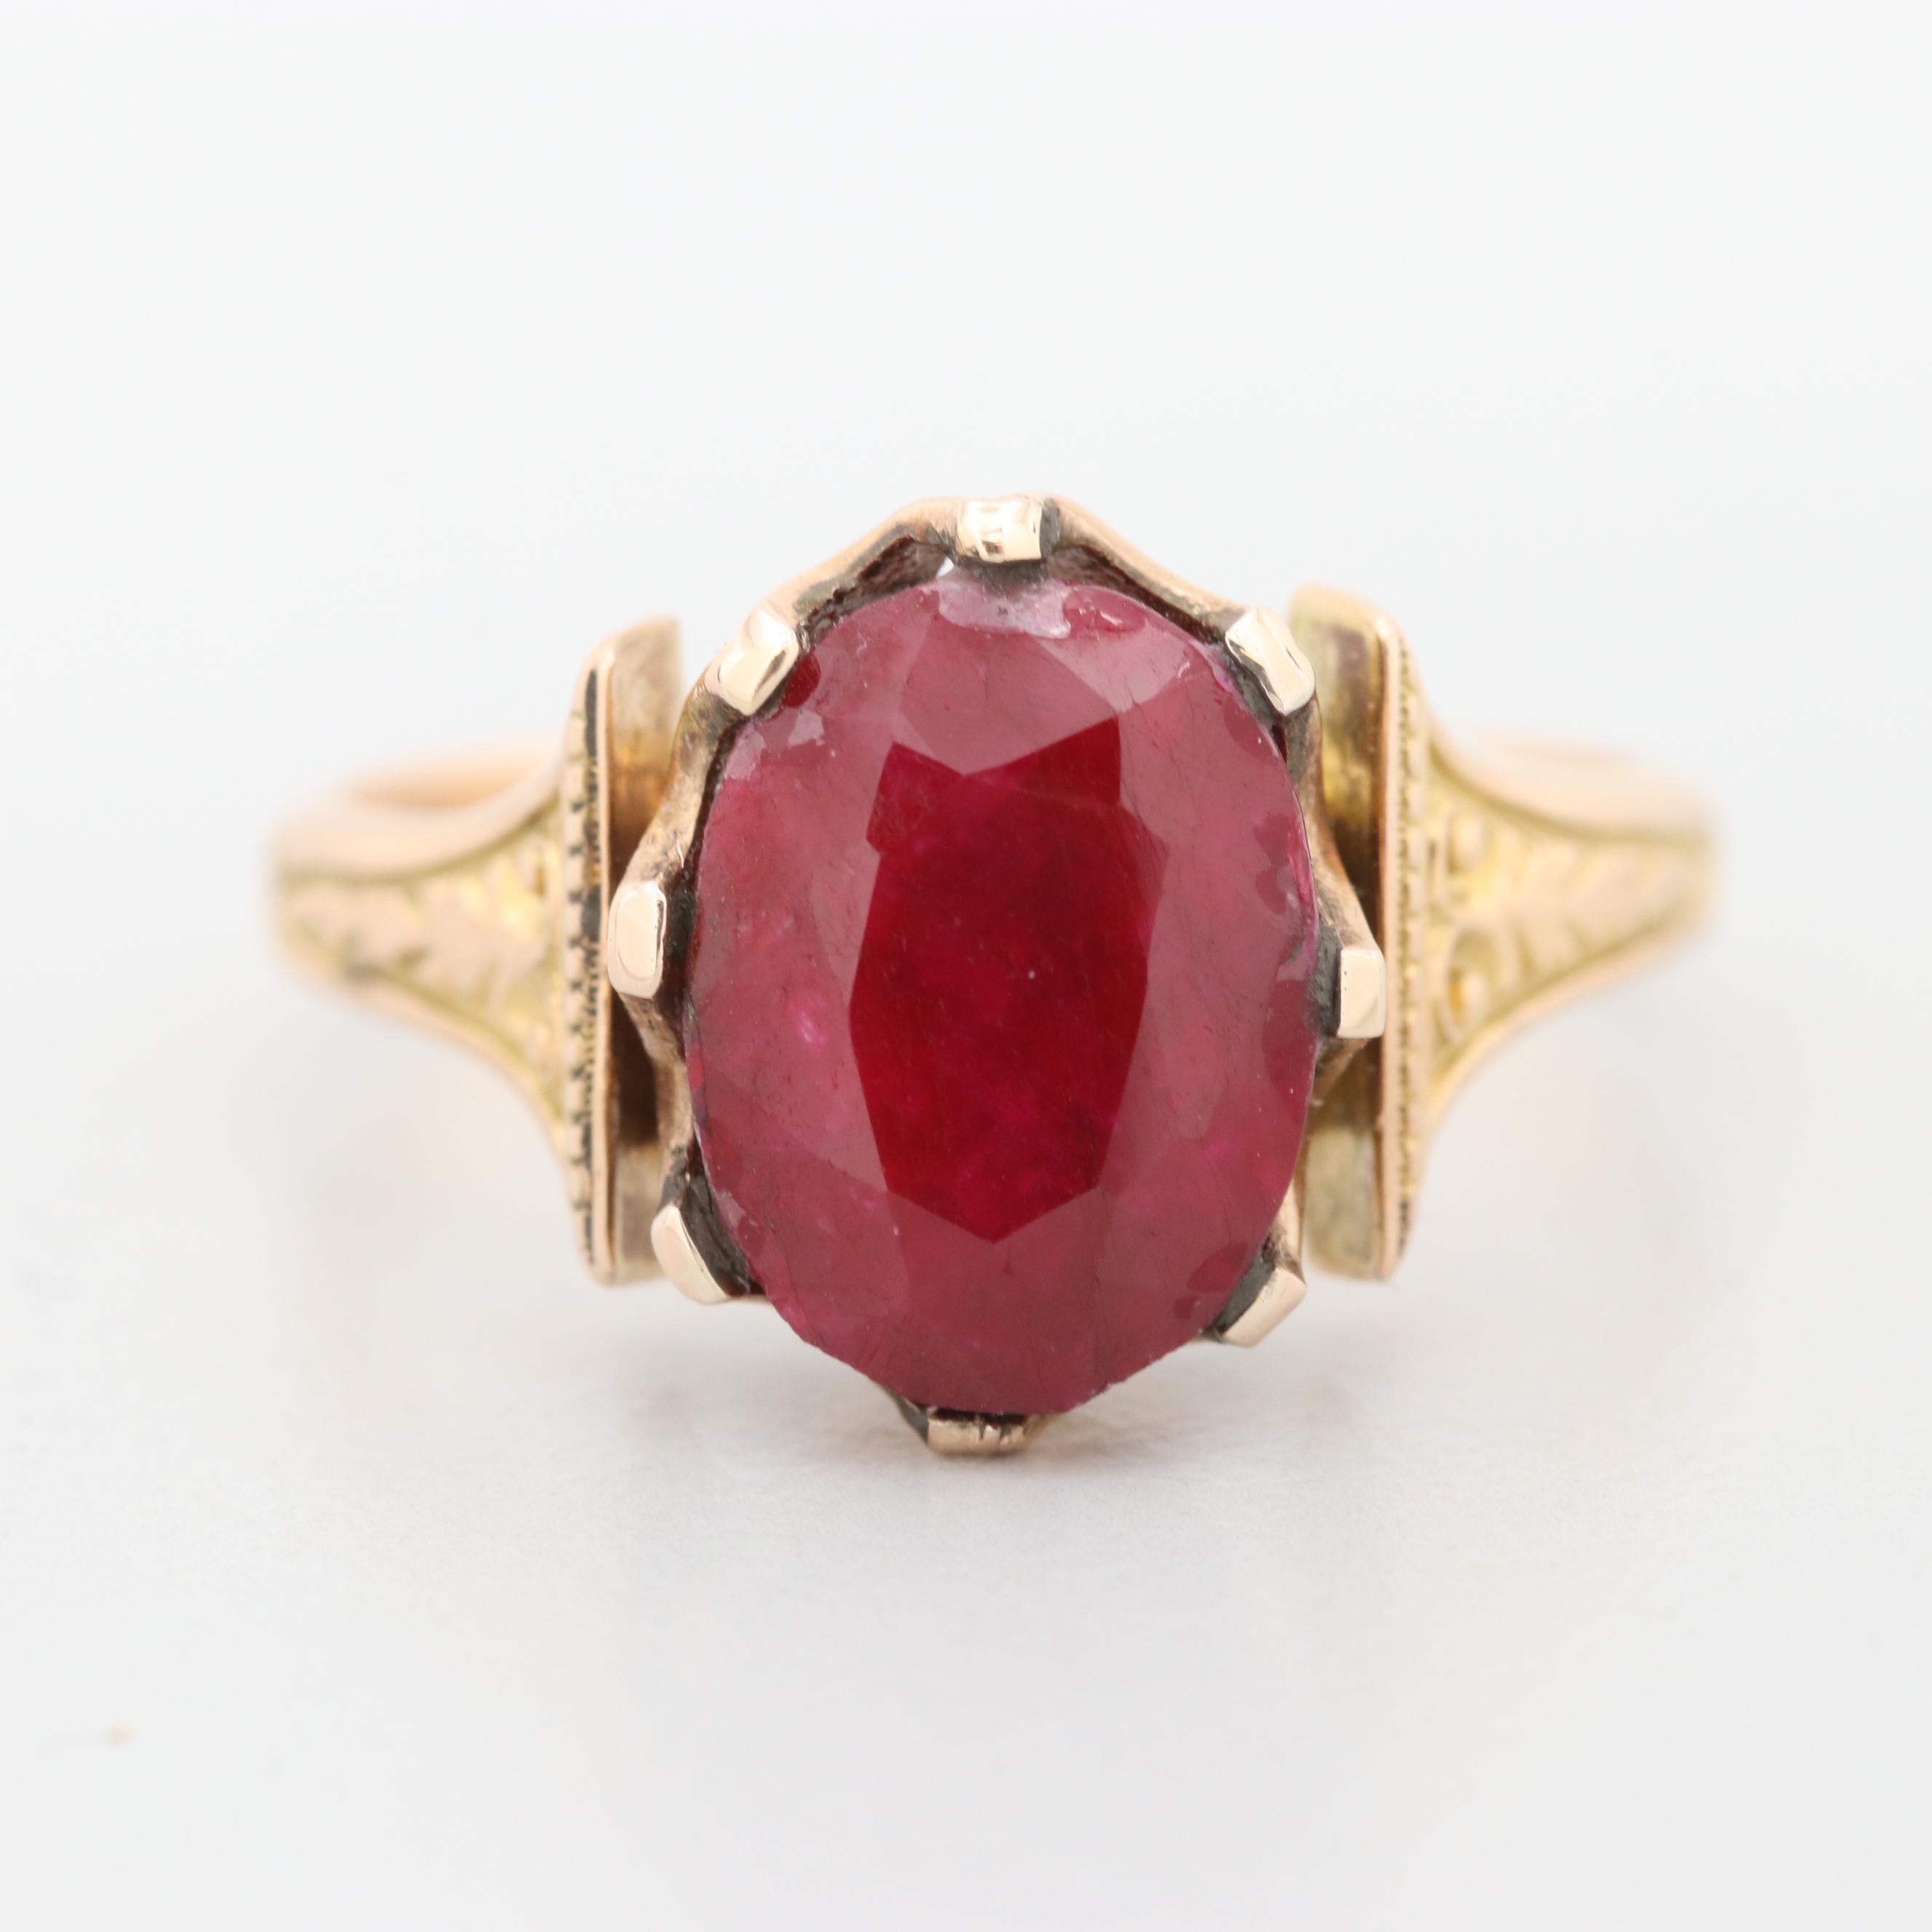 Victorian 18K Yellow Gold Corundum Ring